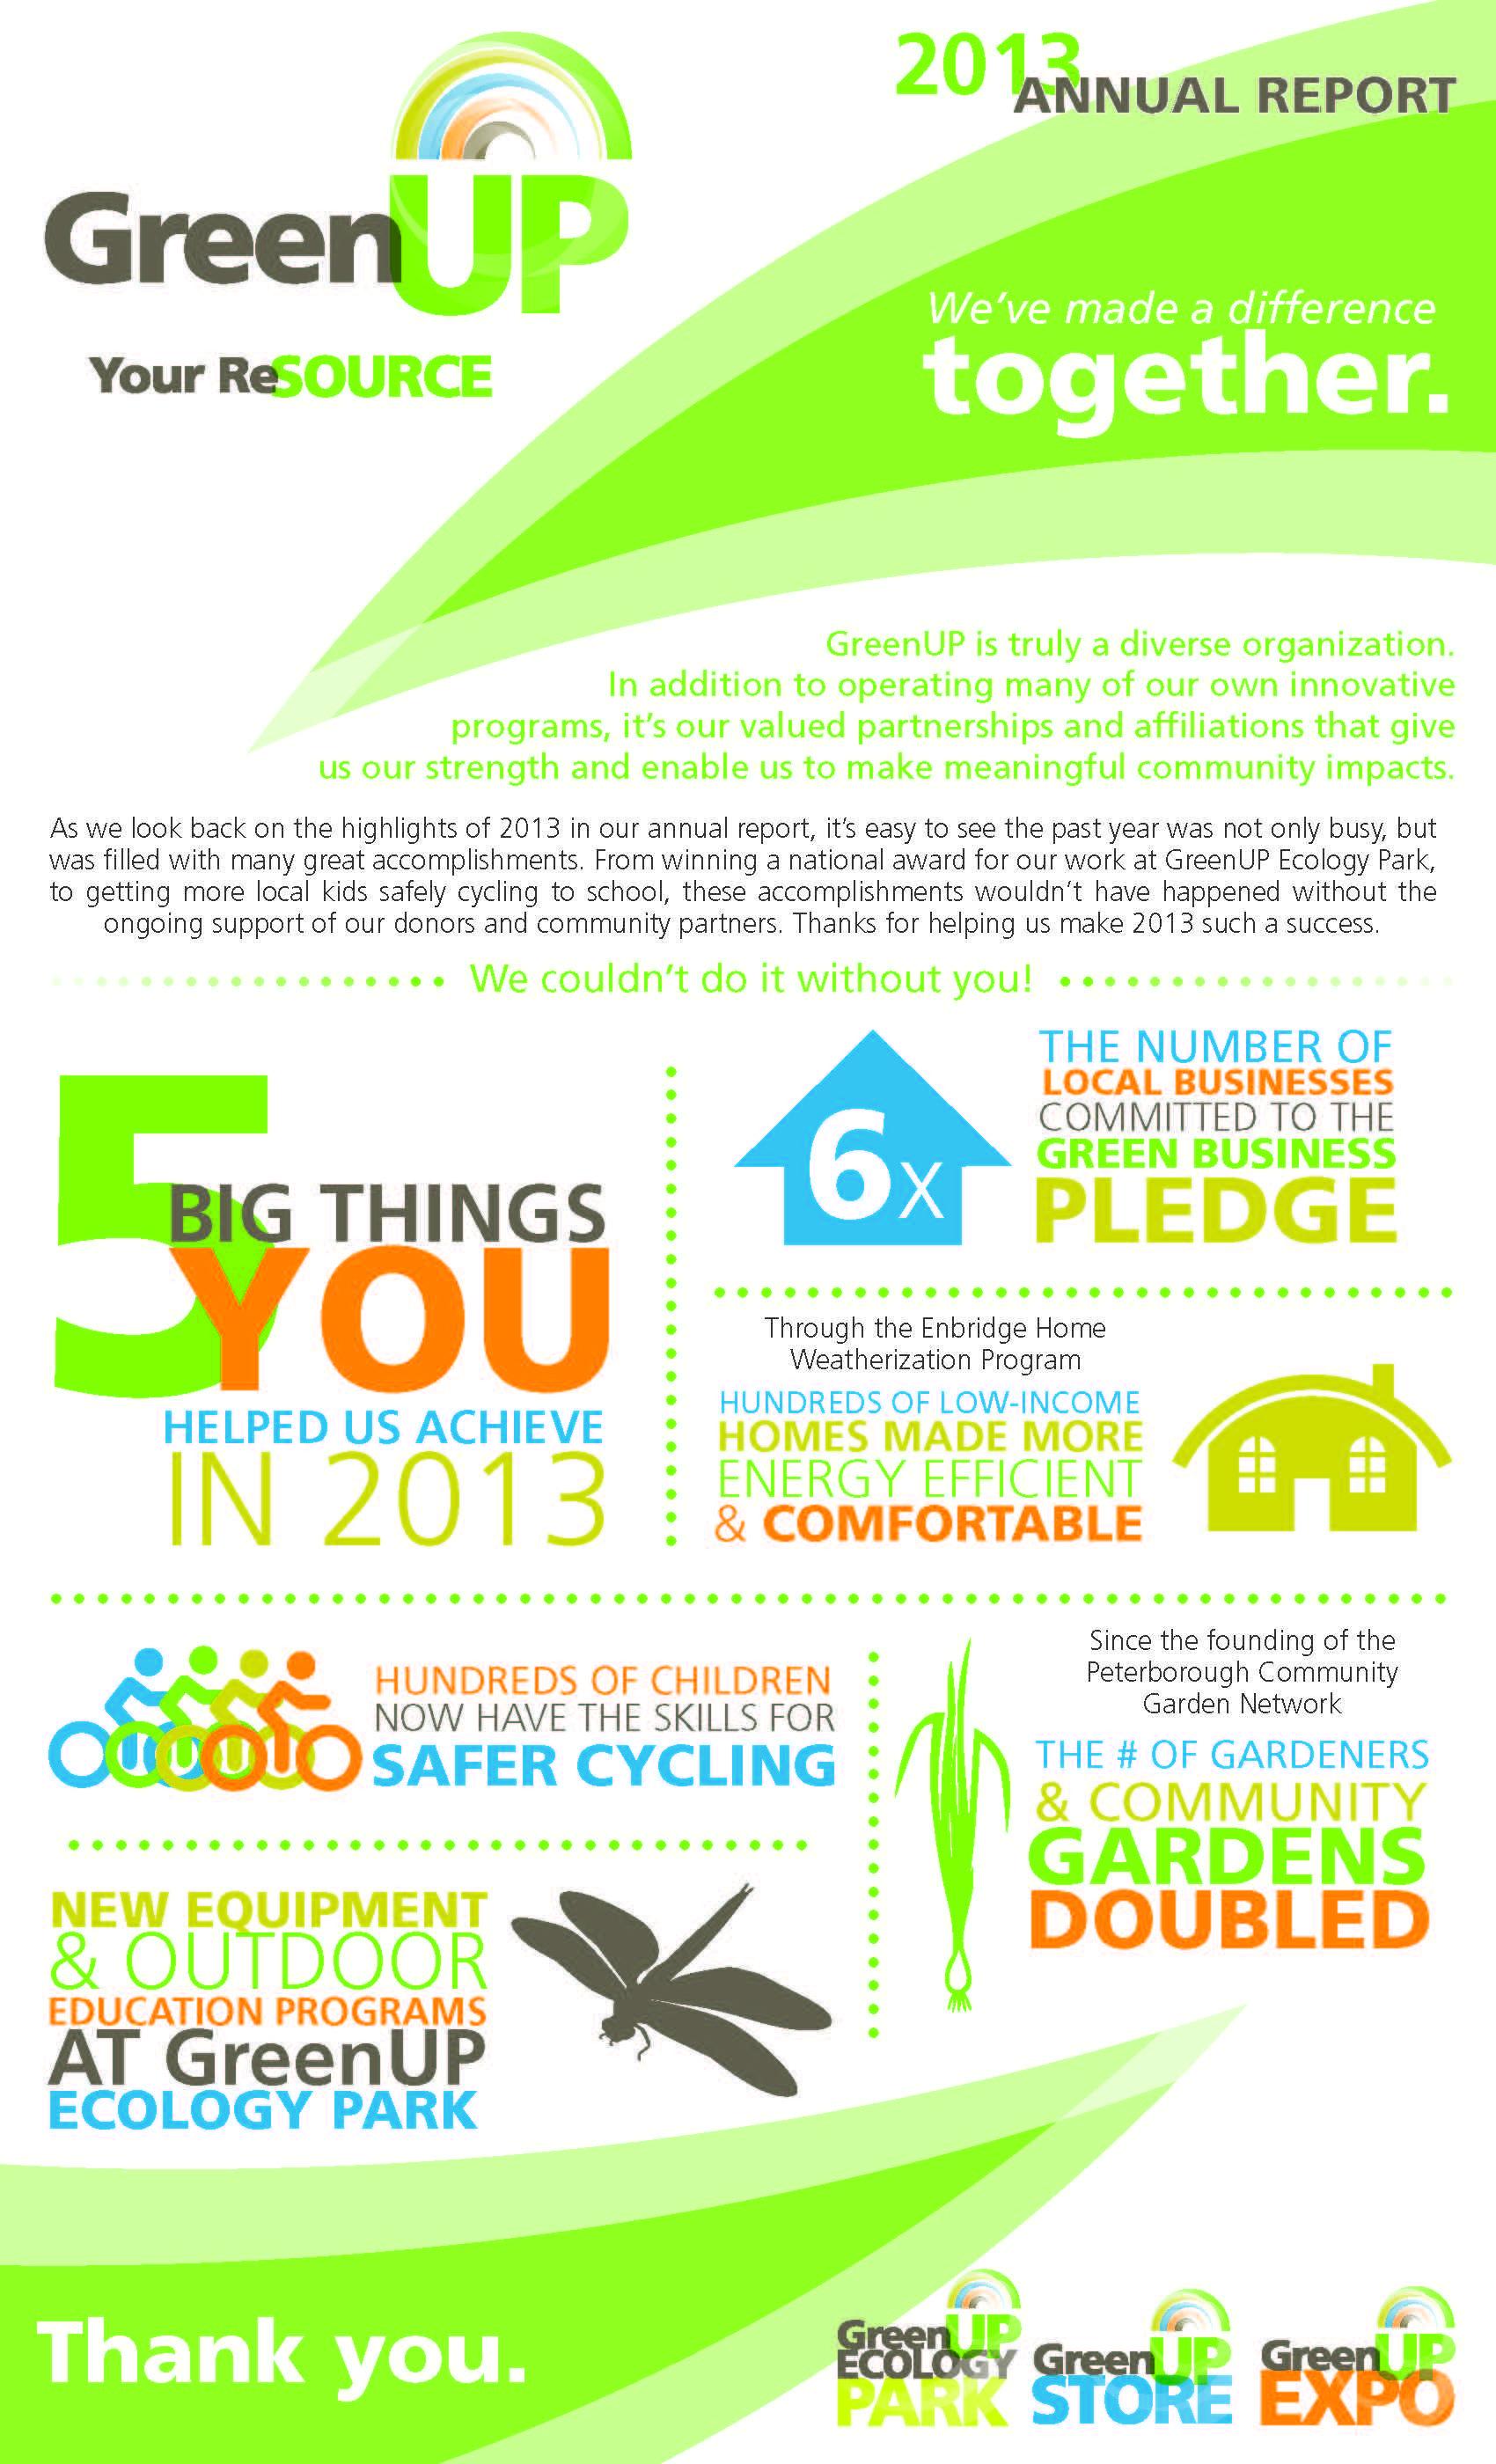 Kivi S Nonprofit Communications Blog Infographic Annual Report Annualreports Kivi S Nonprofit C Nonprofit Annual Report Annual Report Nonprofit Communications